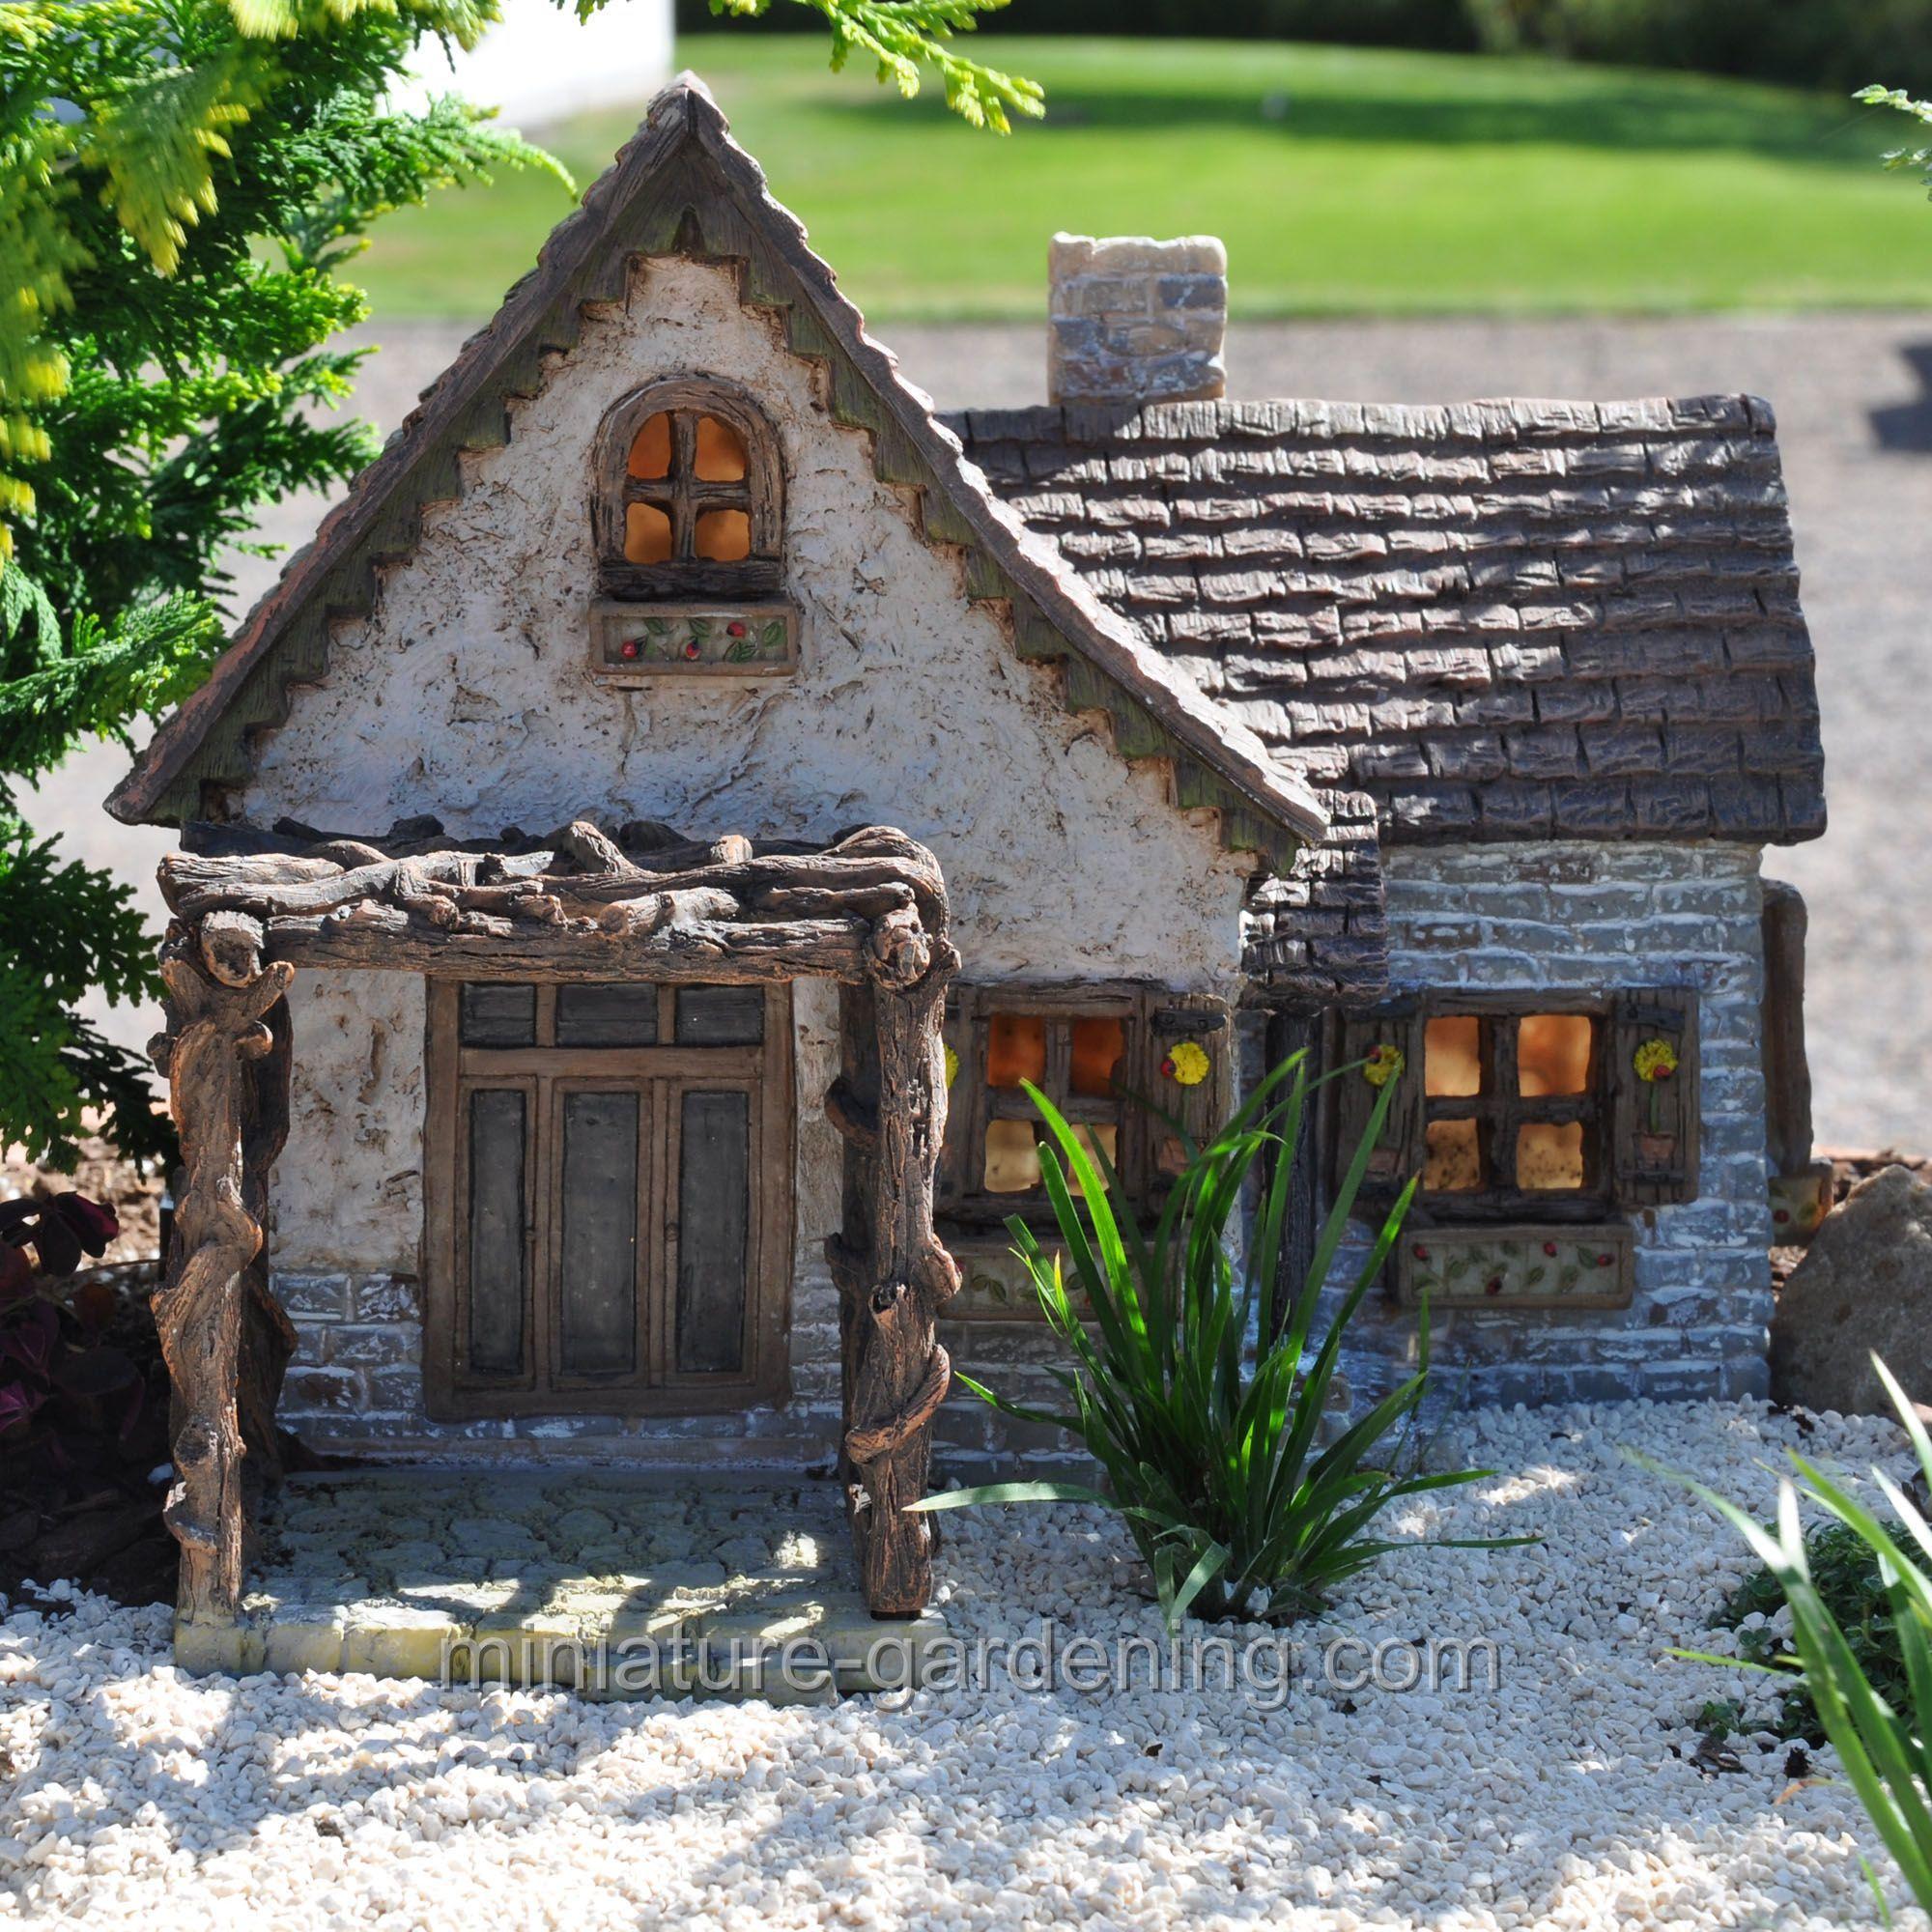 Vilito Castle House Cottage Miniature Fairy Garden Home Houses Decoration Mini Craft Micro Landscaping Accessories Decorative Figurines Miniatures Mini Cottage Castle